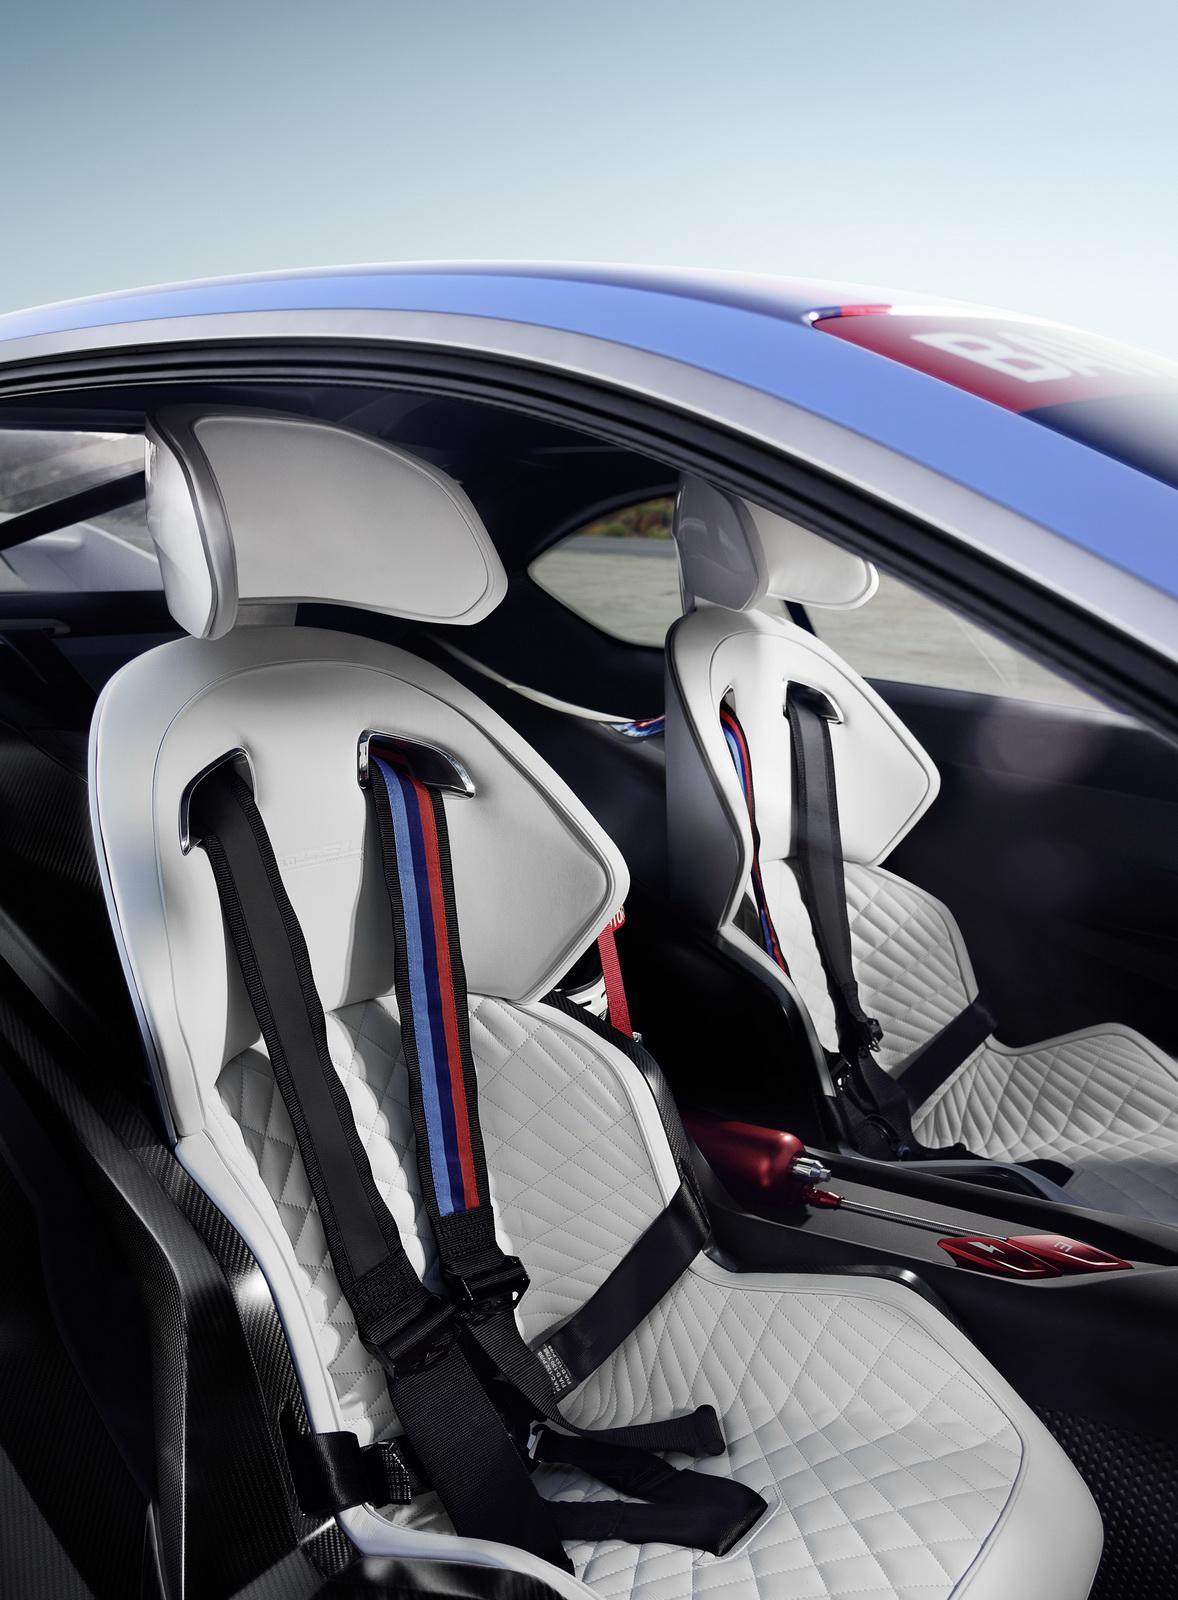 BMW-30-Hommage-R-Concept-22